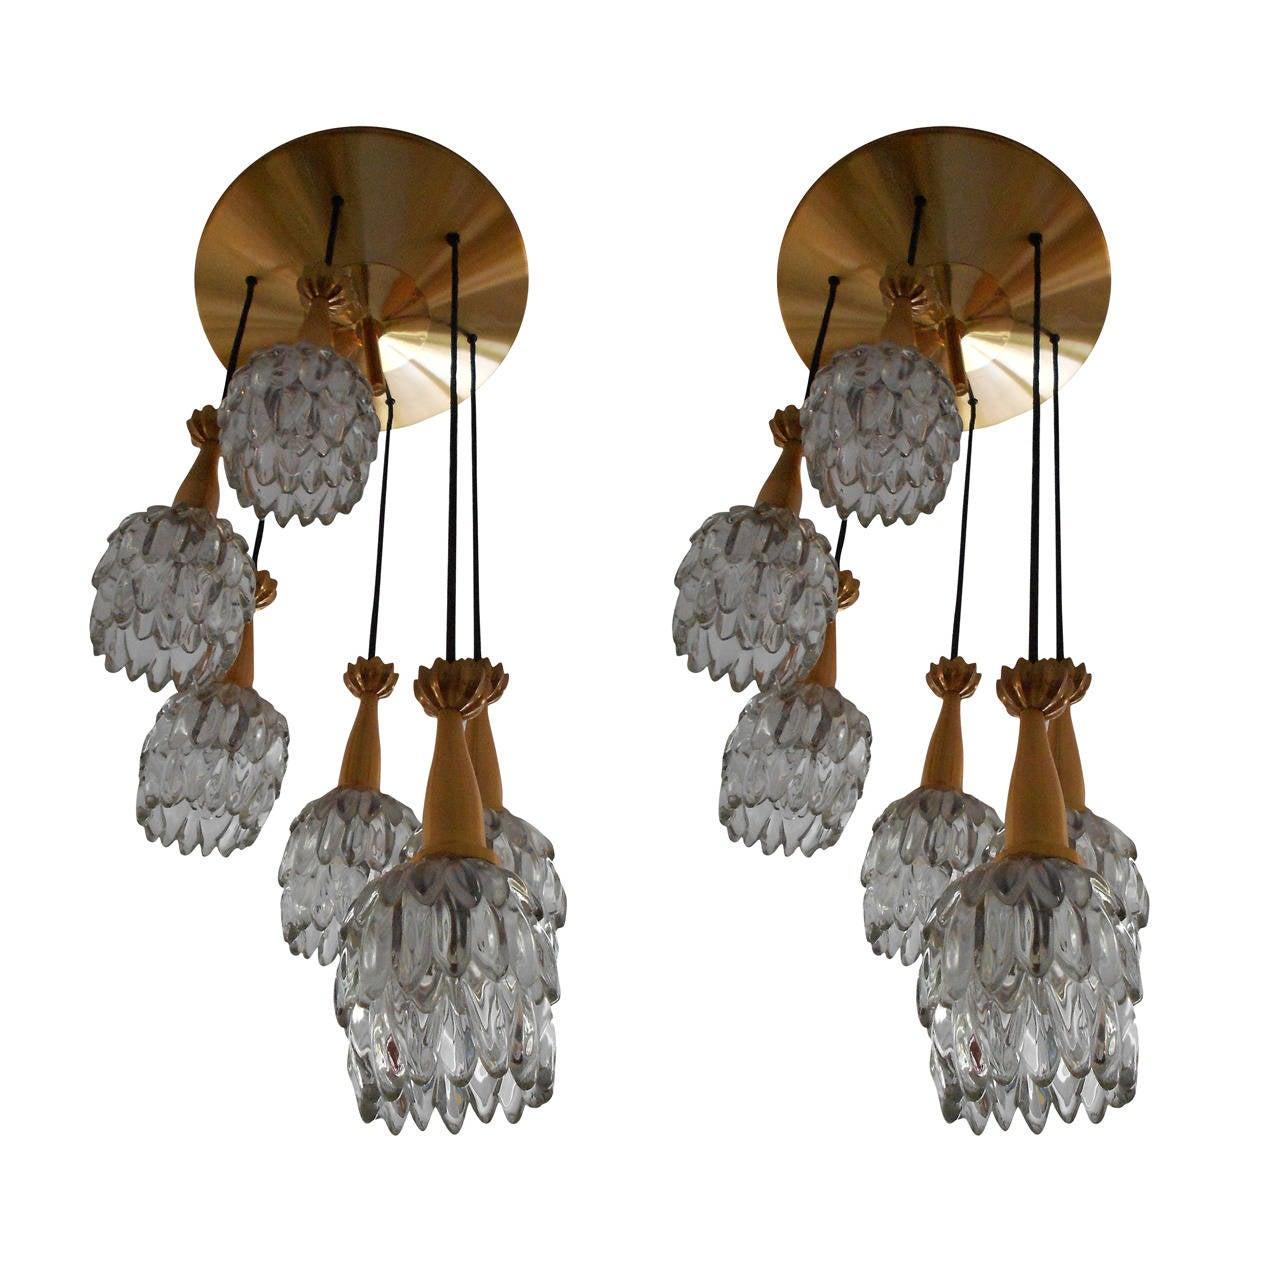 exceptional pair of jean gandelin chute flush mounts or. Black Bedroom Furniture Sets. Home Design Ideas